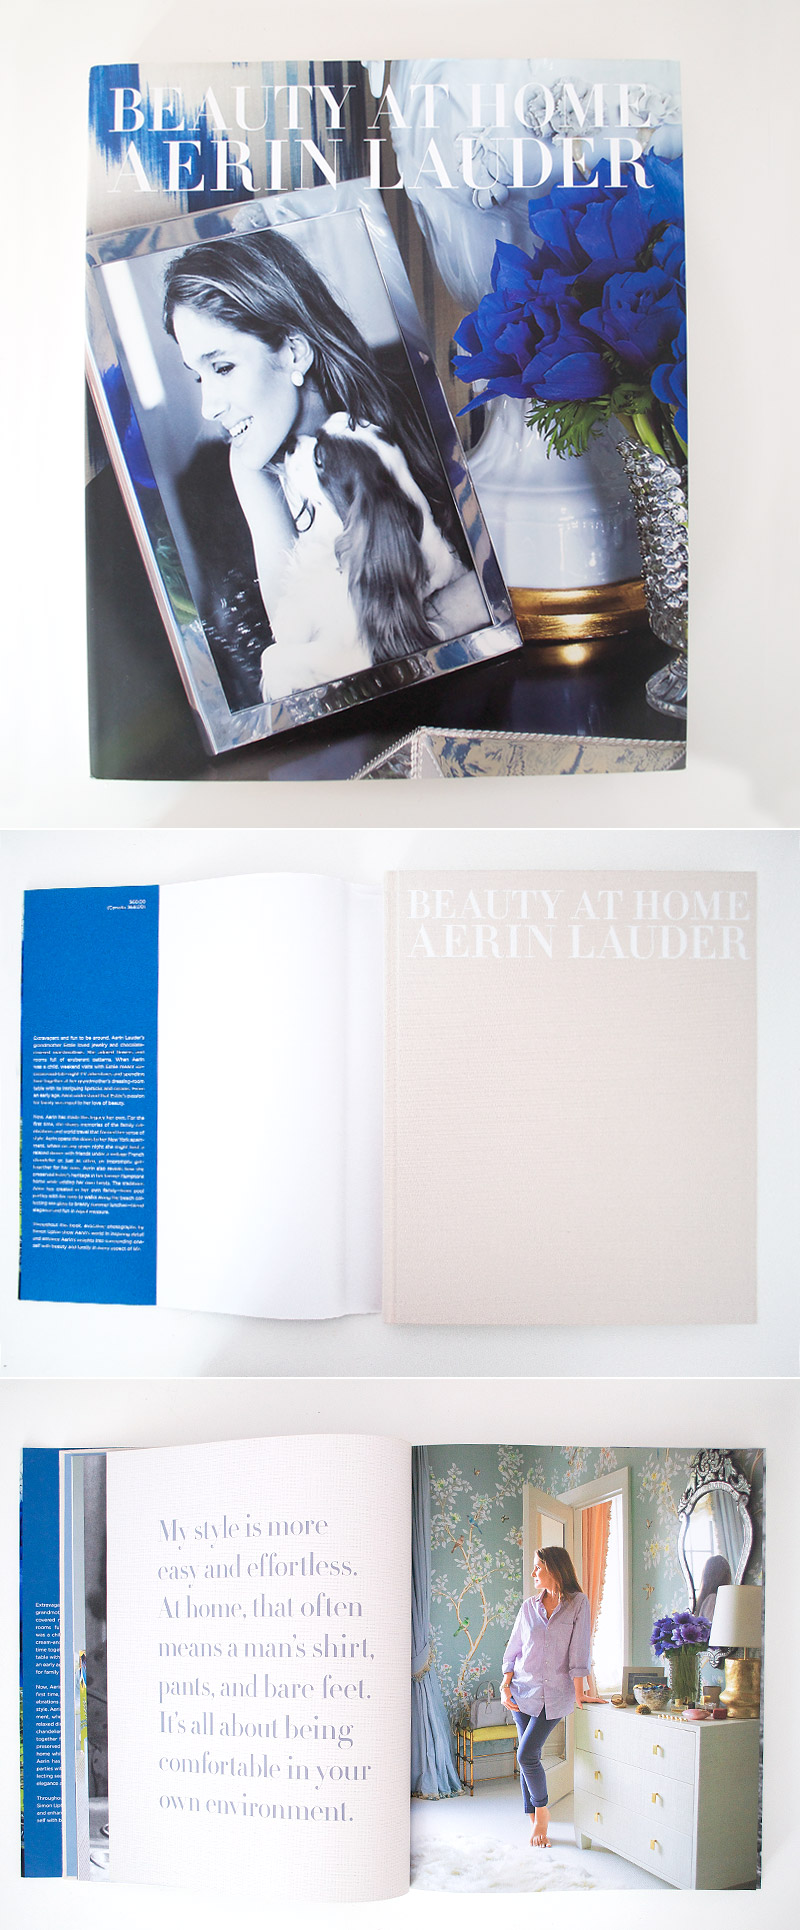 living-gazette-barbara-resende-decor-livro-beauty-at-home-aerin-lauder-capa